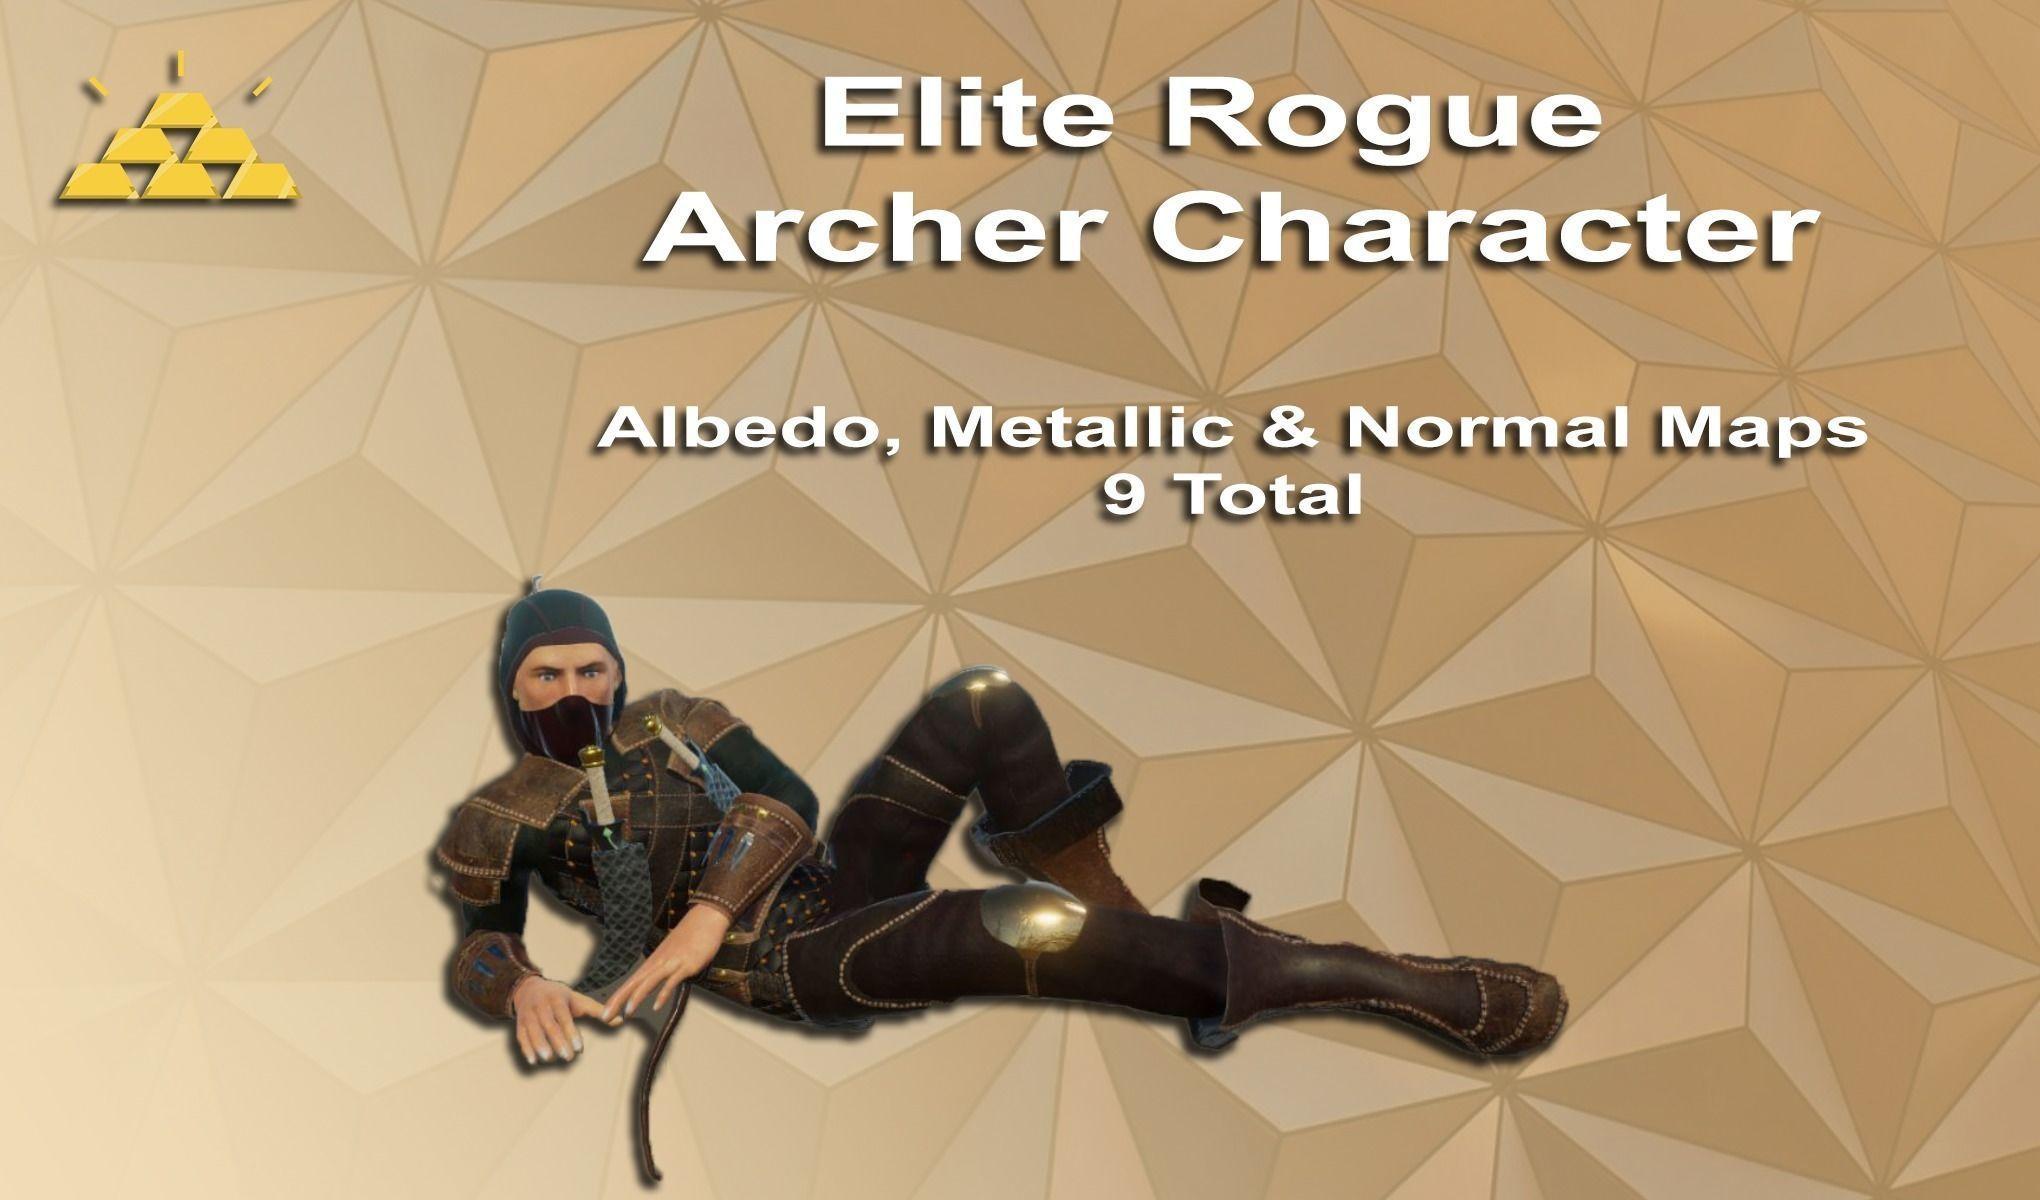 Elite Rogue Archer Character